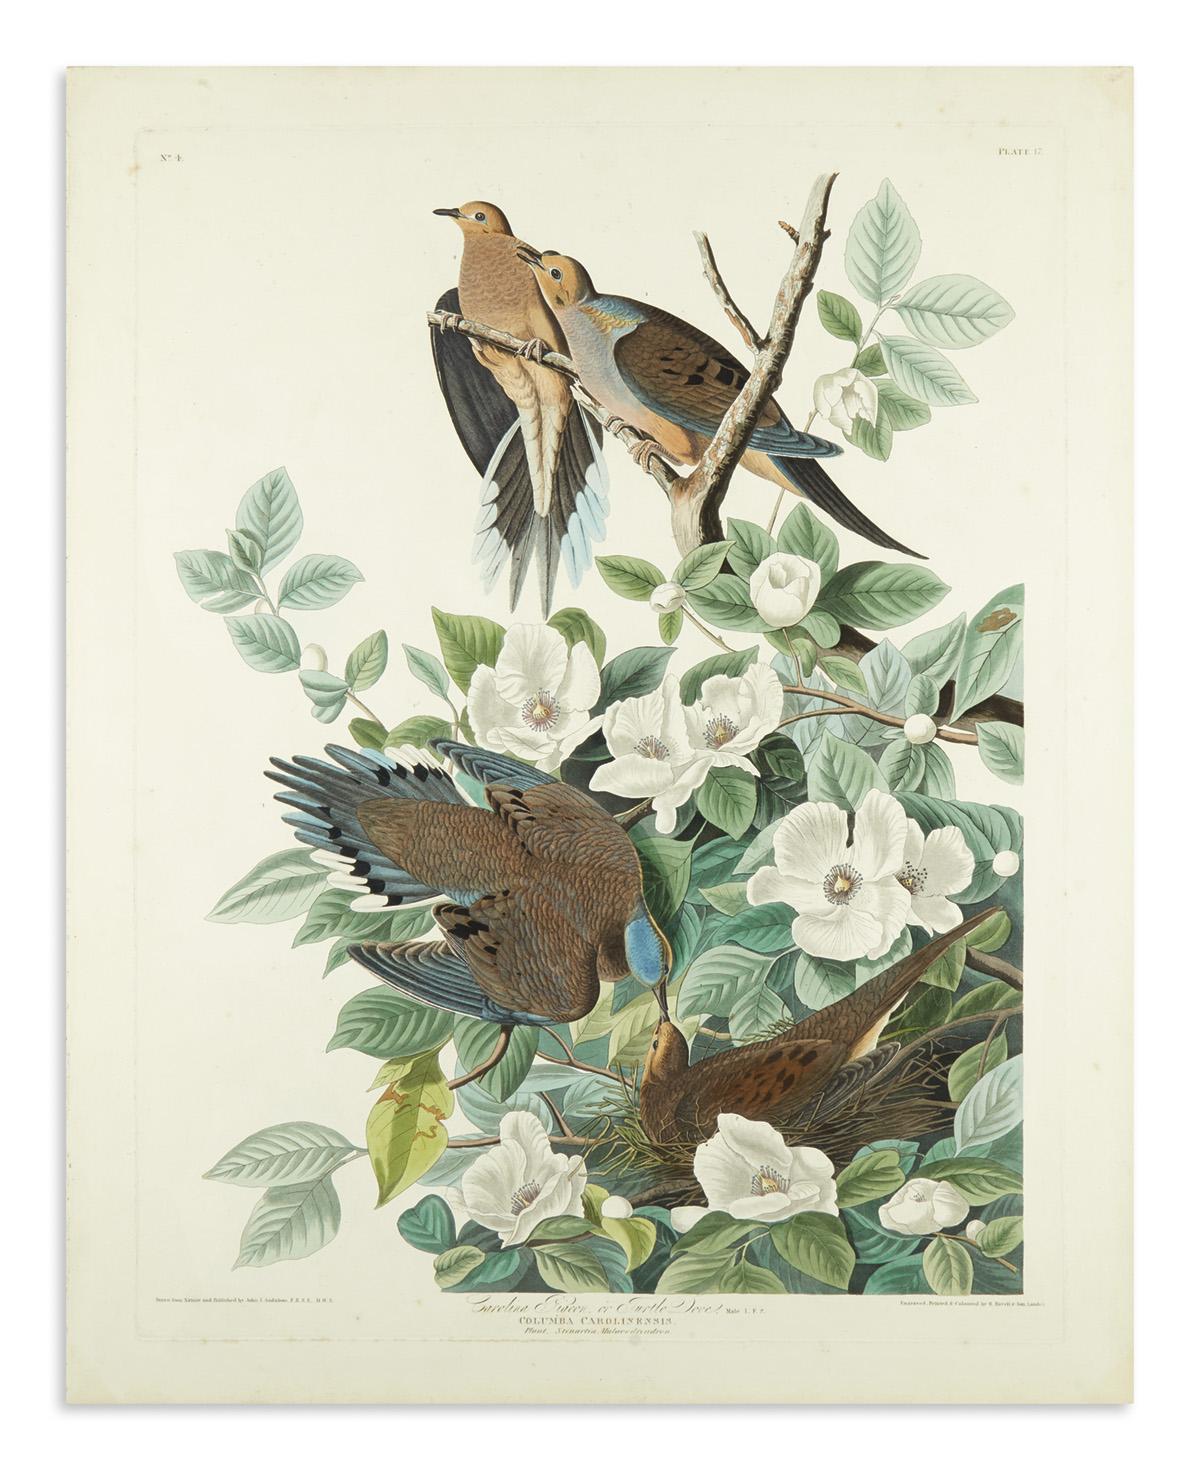 AUDUBON-JOHN-JAMES-Carolina-Pigeon-or-Turtle-Dove-Plate-17-[